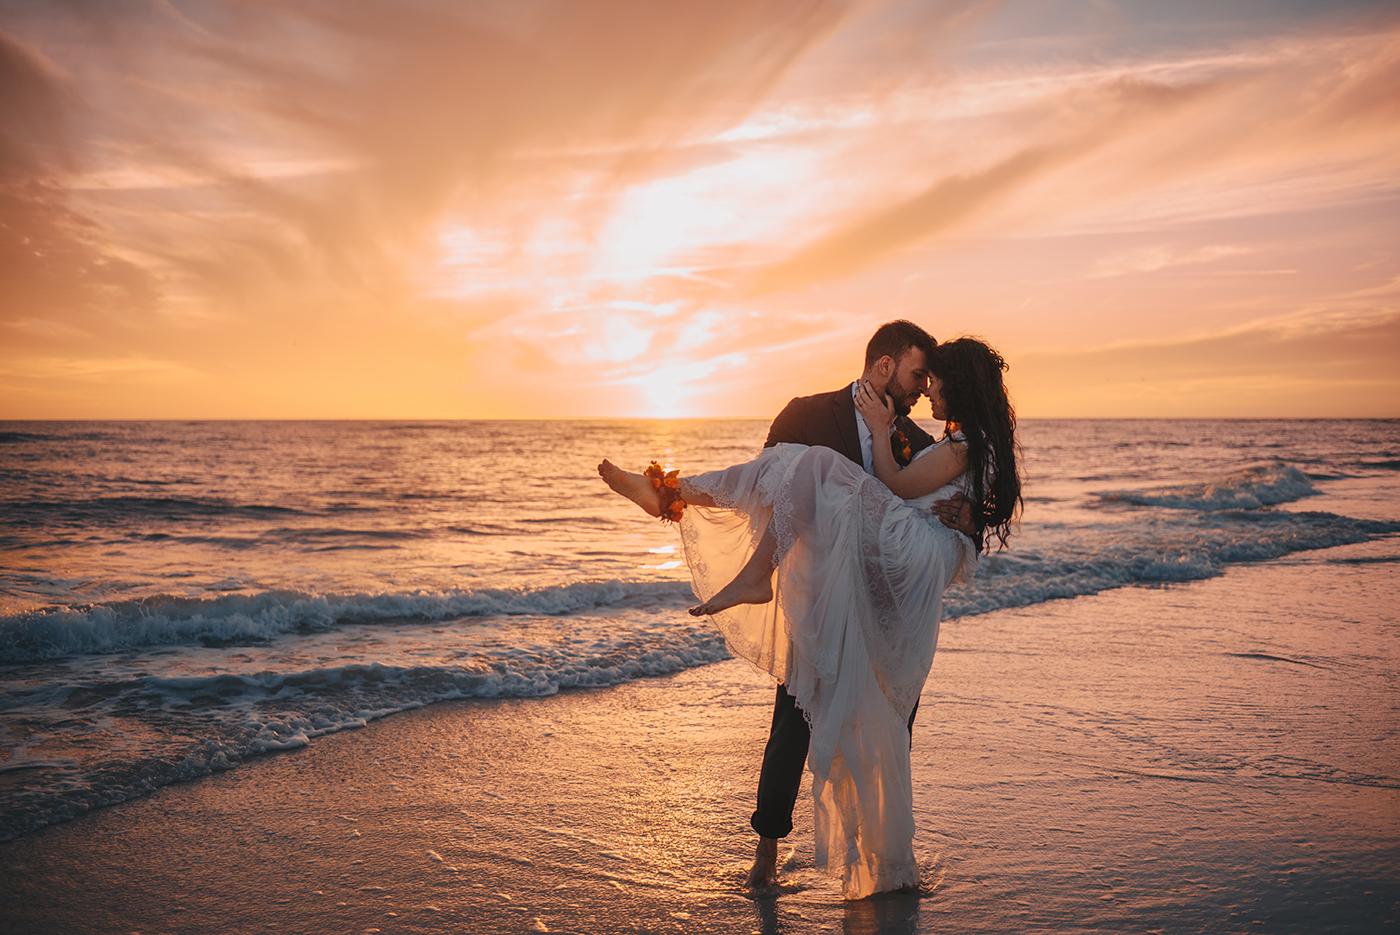 Los-Vargas-Photo-Moana-Wedding-Style-shoot-127.jpg